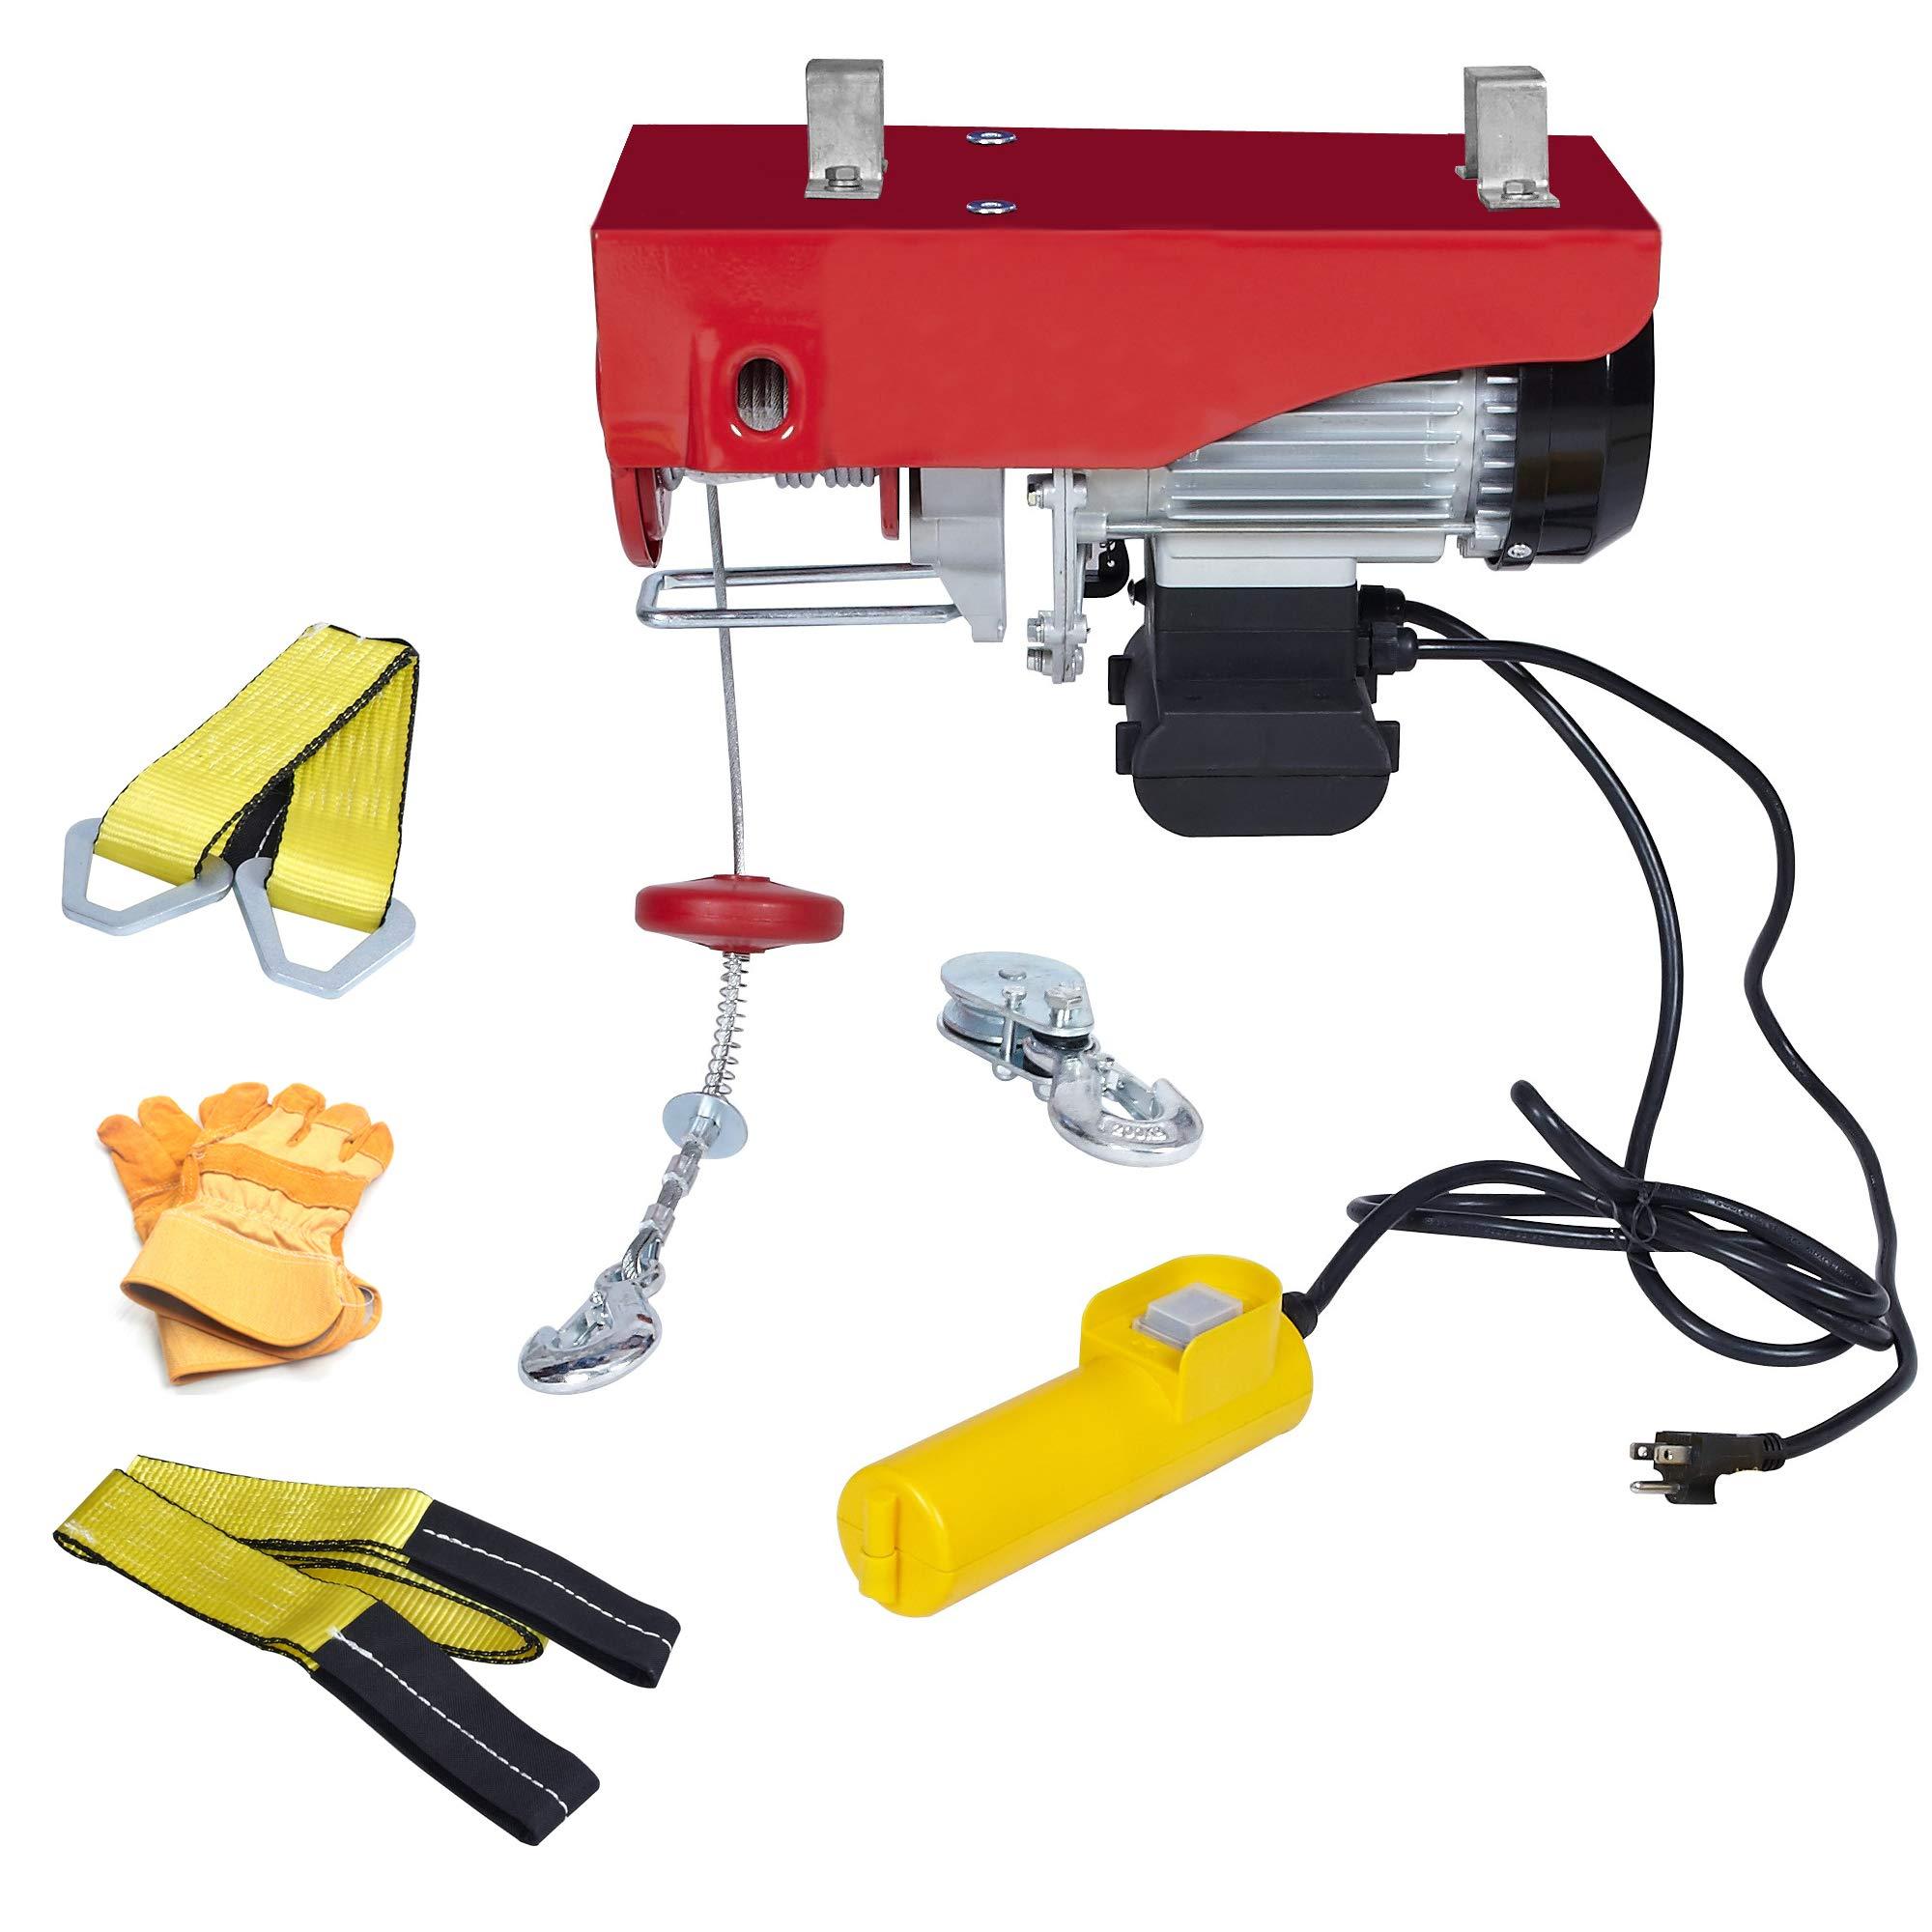 SWL 150 KGS PLUSKER 304 Stainless Steel Clevis Slip Hook 3//16 American Type Swivel Eye Lifting Hoisting Chain Hooks for Rigging Accessory